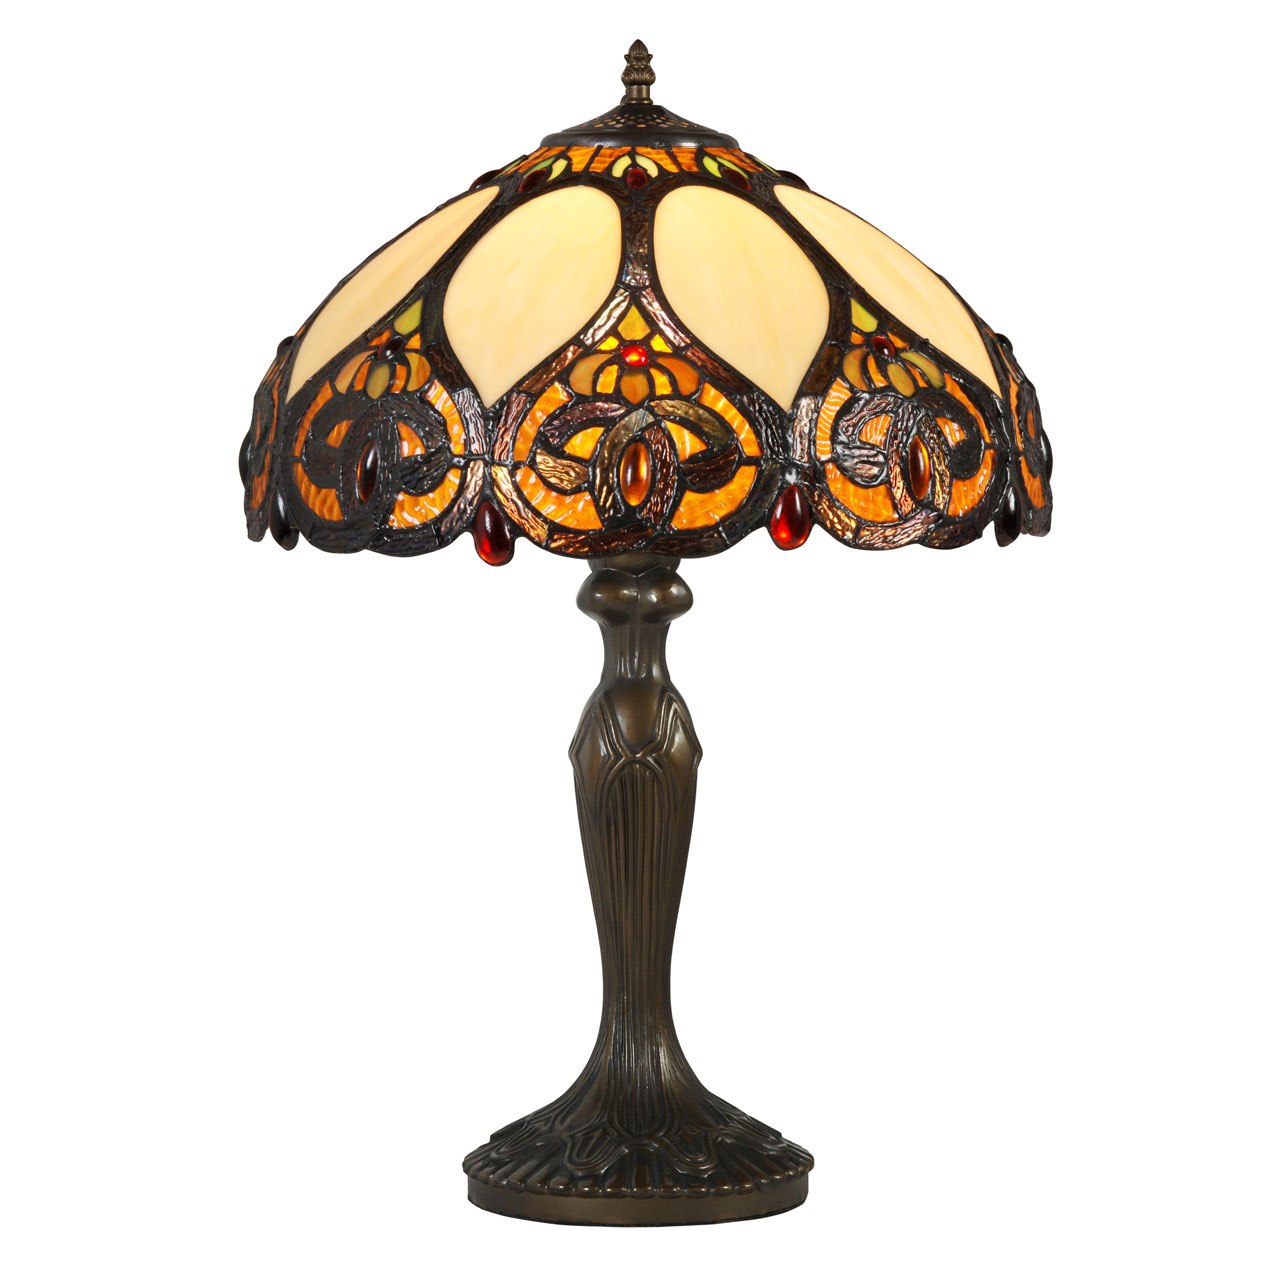 60cm high trinity table lamp light tiffany style glass shade ebay. Black Bedroom Furniture Sets. Home Design Ideas